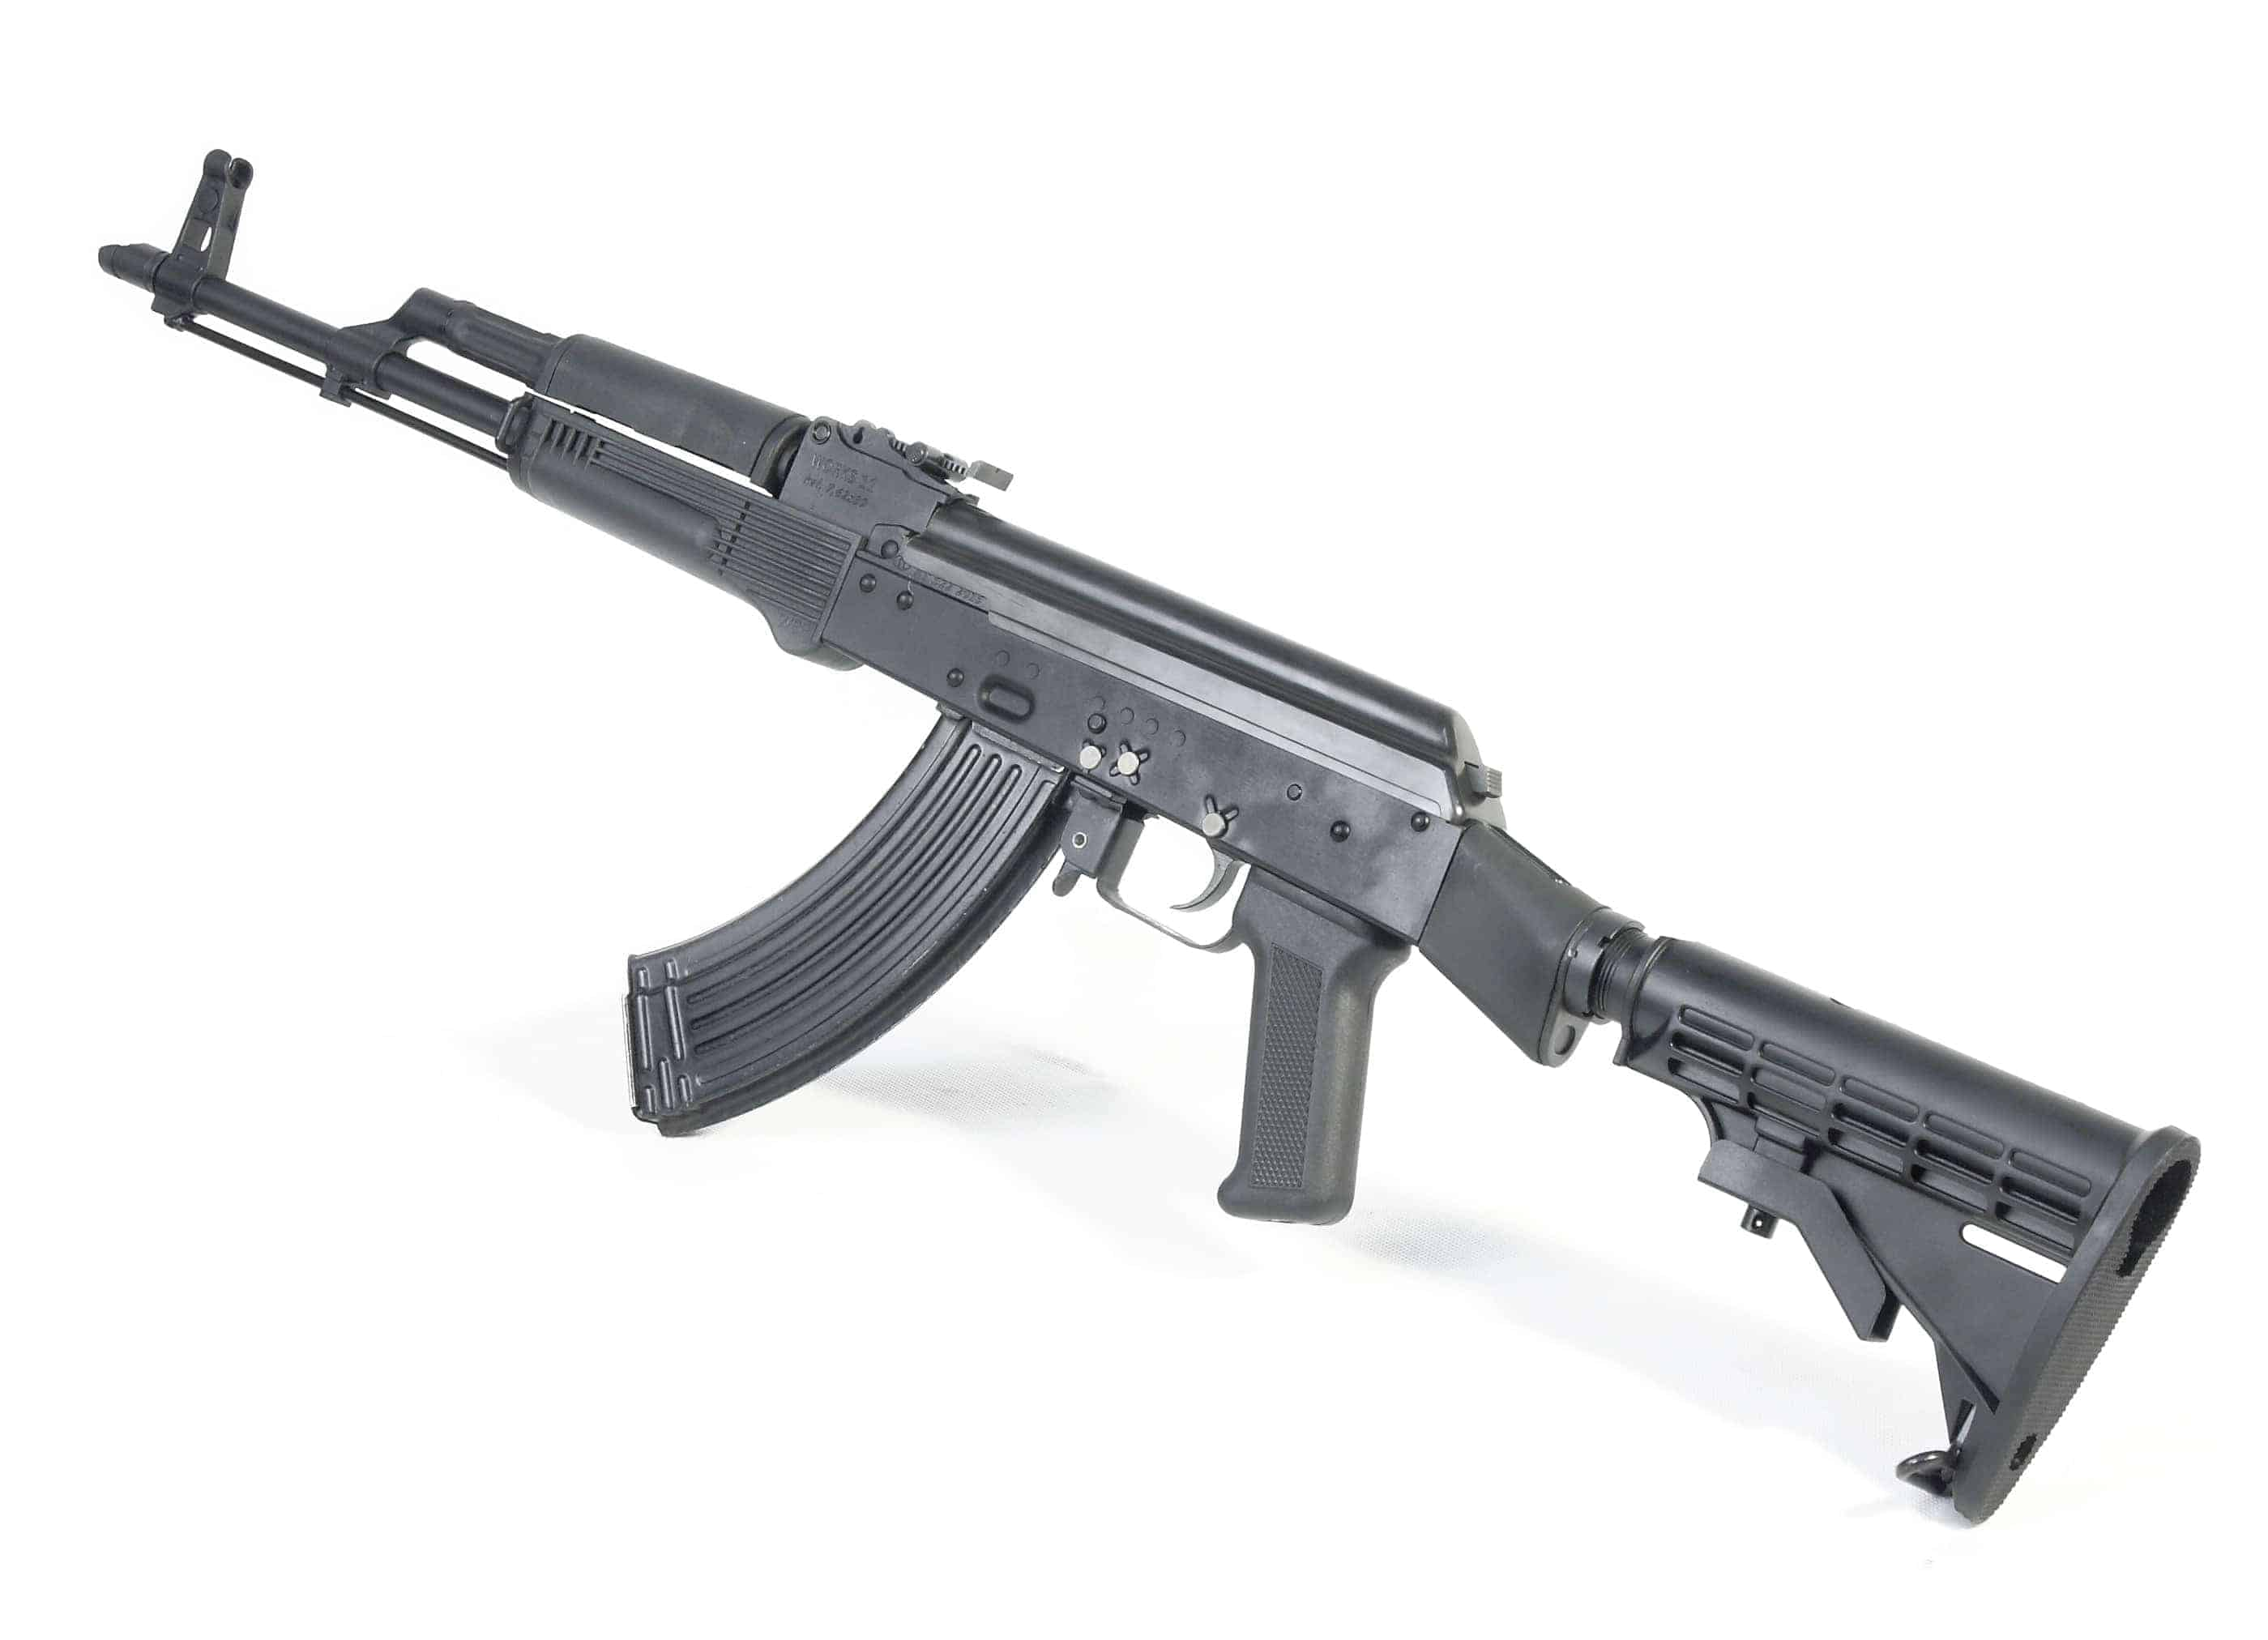 https://strzelnicabojowa.pl/uploads/guns/AKMS-TAC2-20160611-WEB-WIDE.JPG